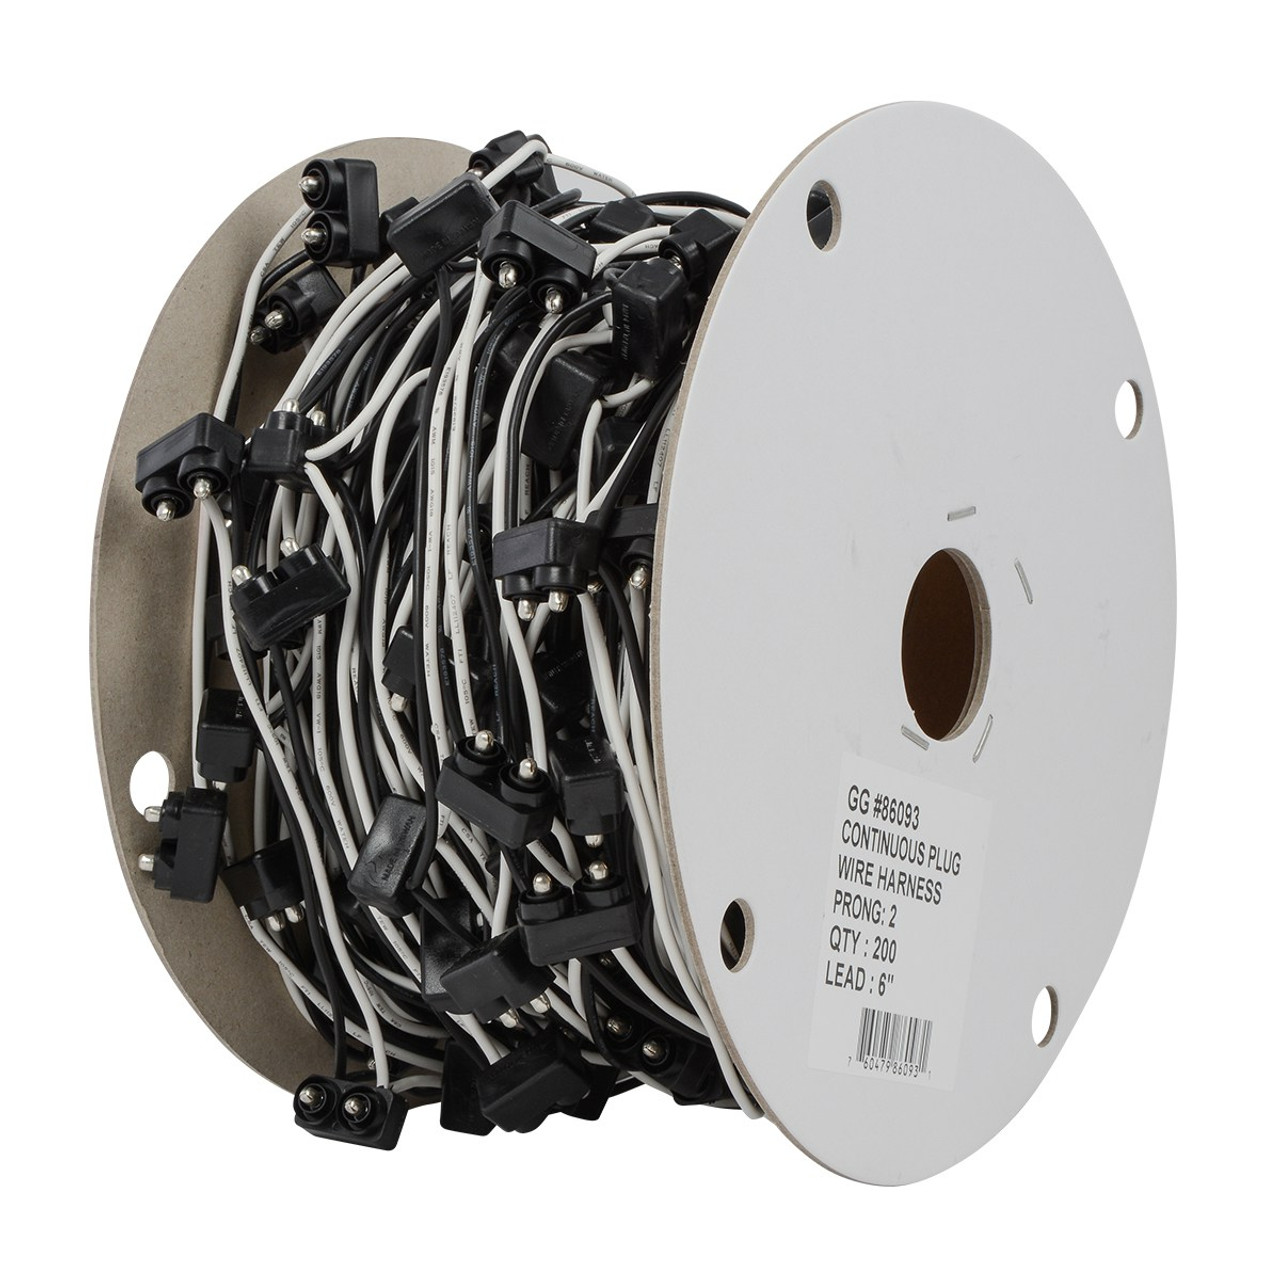 Zephyr Wiring Harness